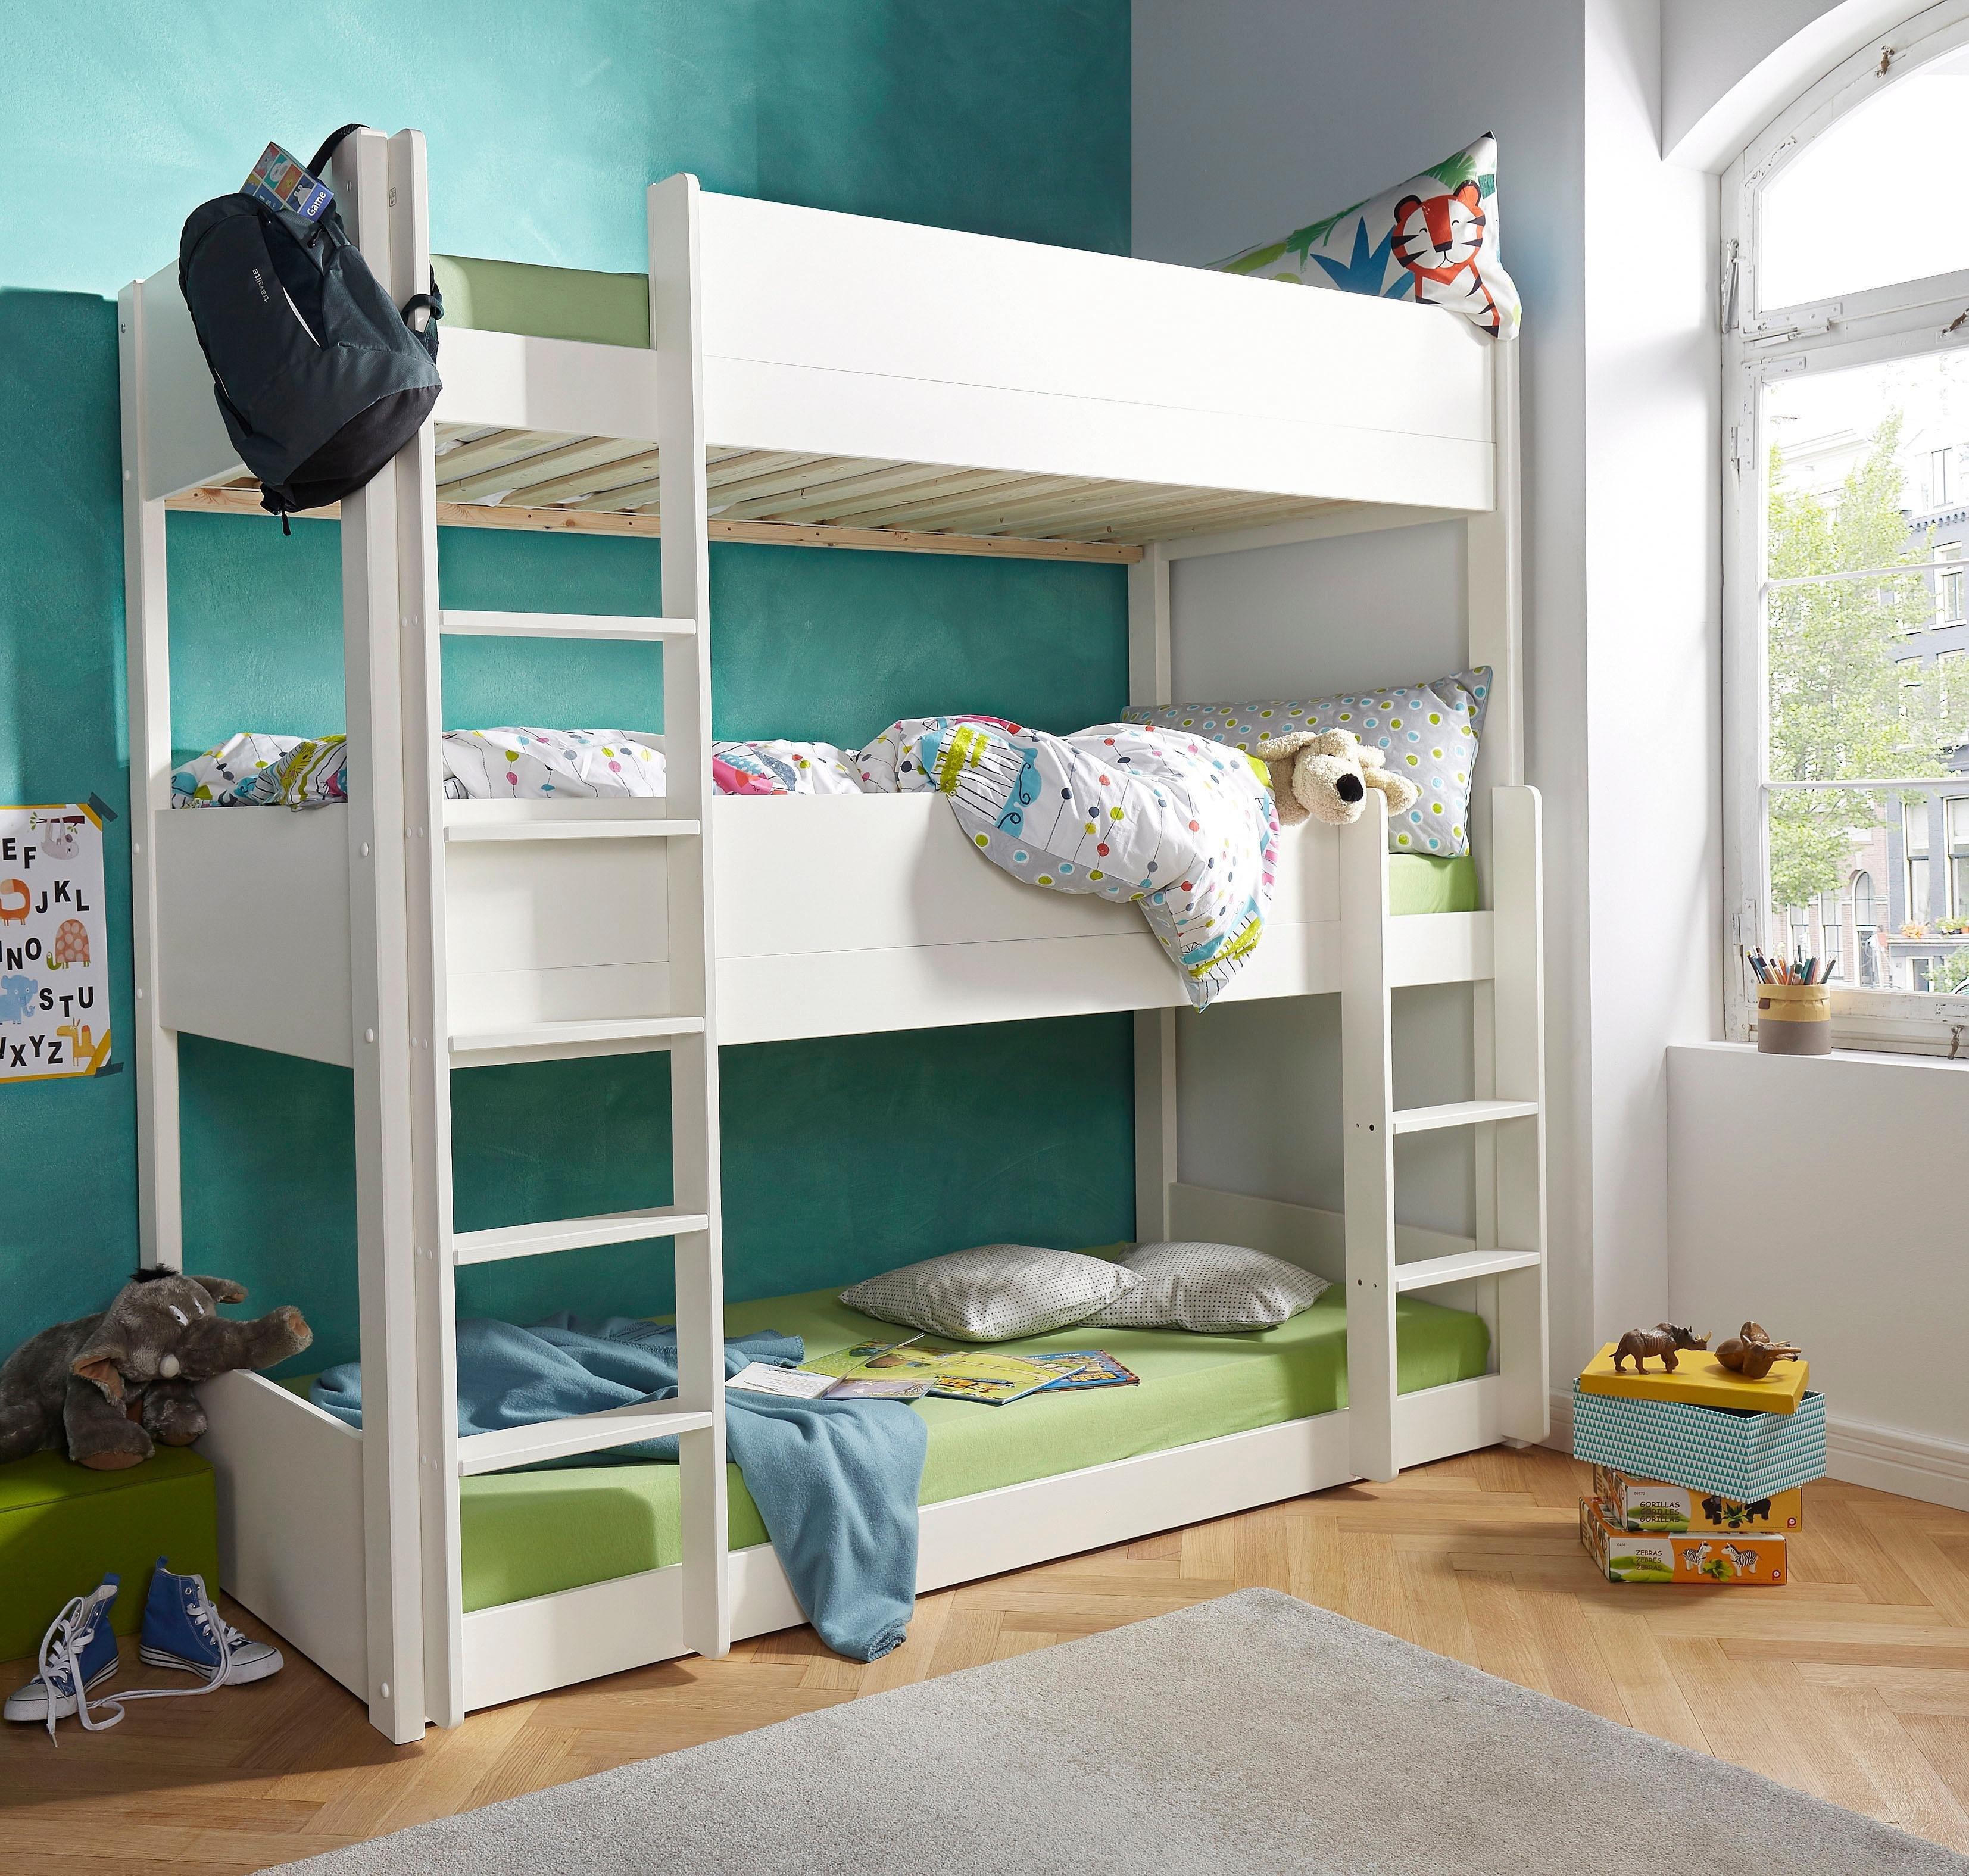 goedkoop stapelbed stapelbed jelle dora the explorer with. Black Bedroom Furniture Sets. Home Design Ideas